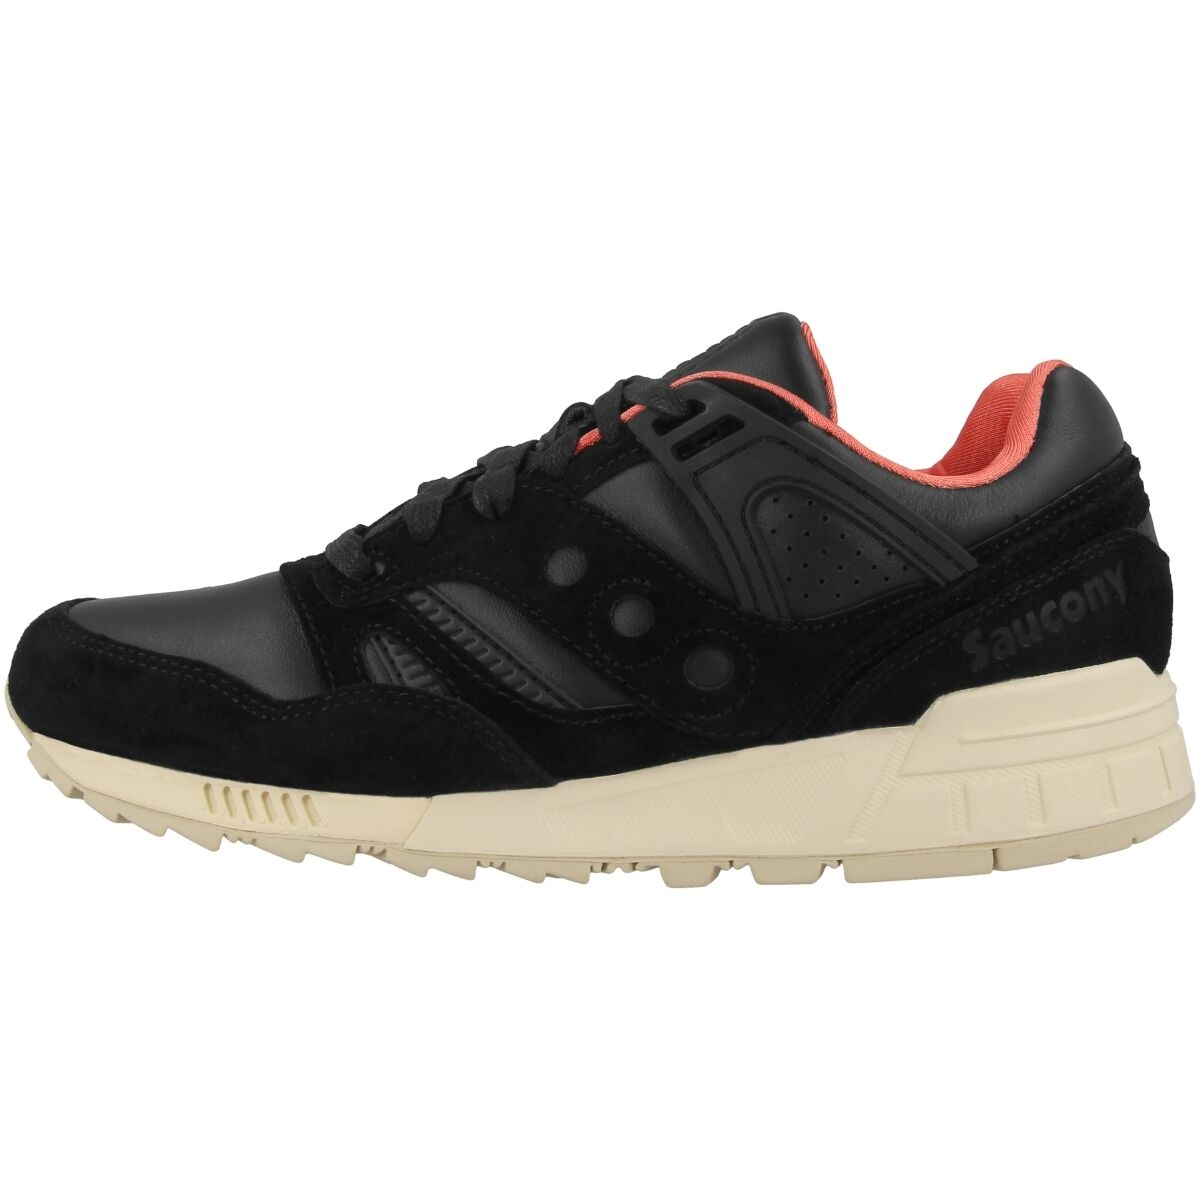 Saucony Sneaker Grid SD Schuhe Herren Freizeit  Sneaker Saucony schwarz S70263-3 Jazz Kinvara cdb7e0